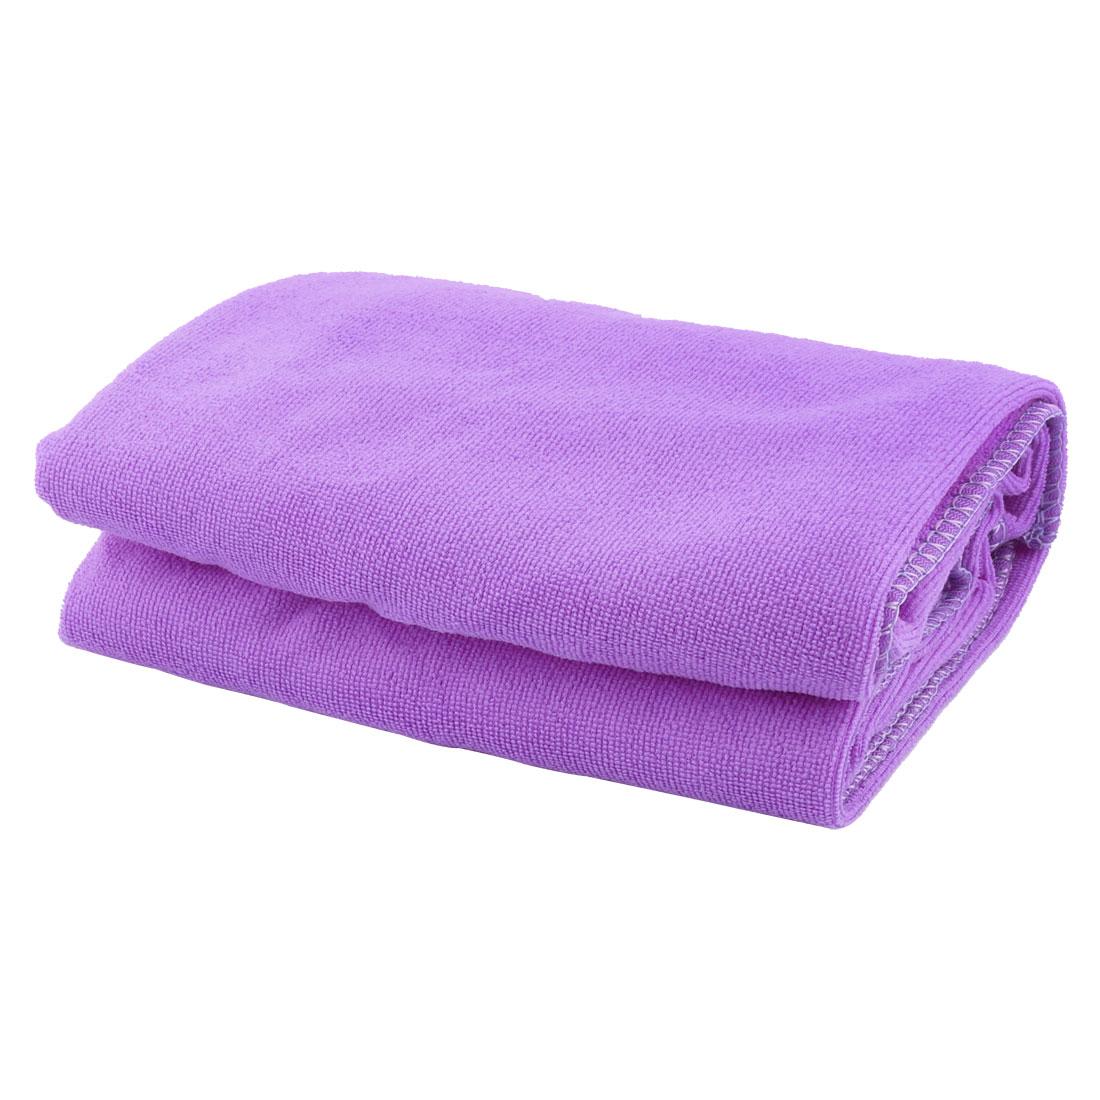 Household Hotel Beach Terry Rectangular Shaped Bath Towel Purple 70cm x 140cm